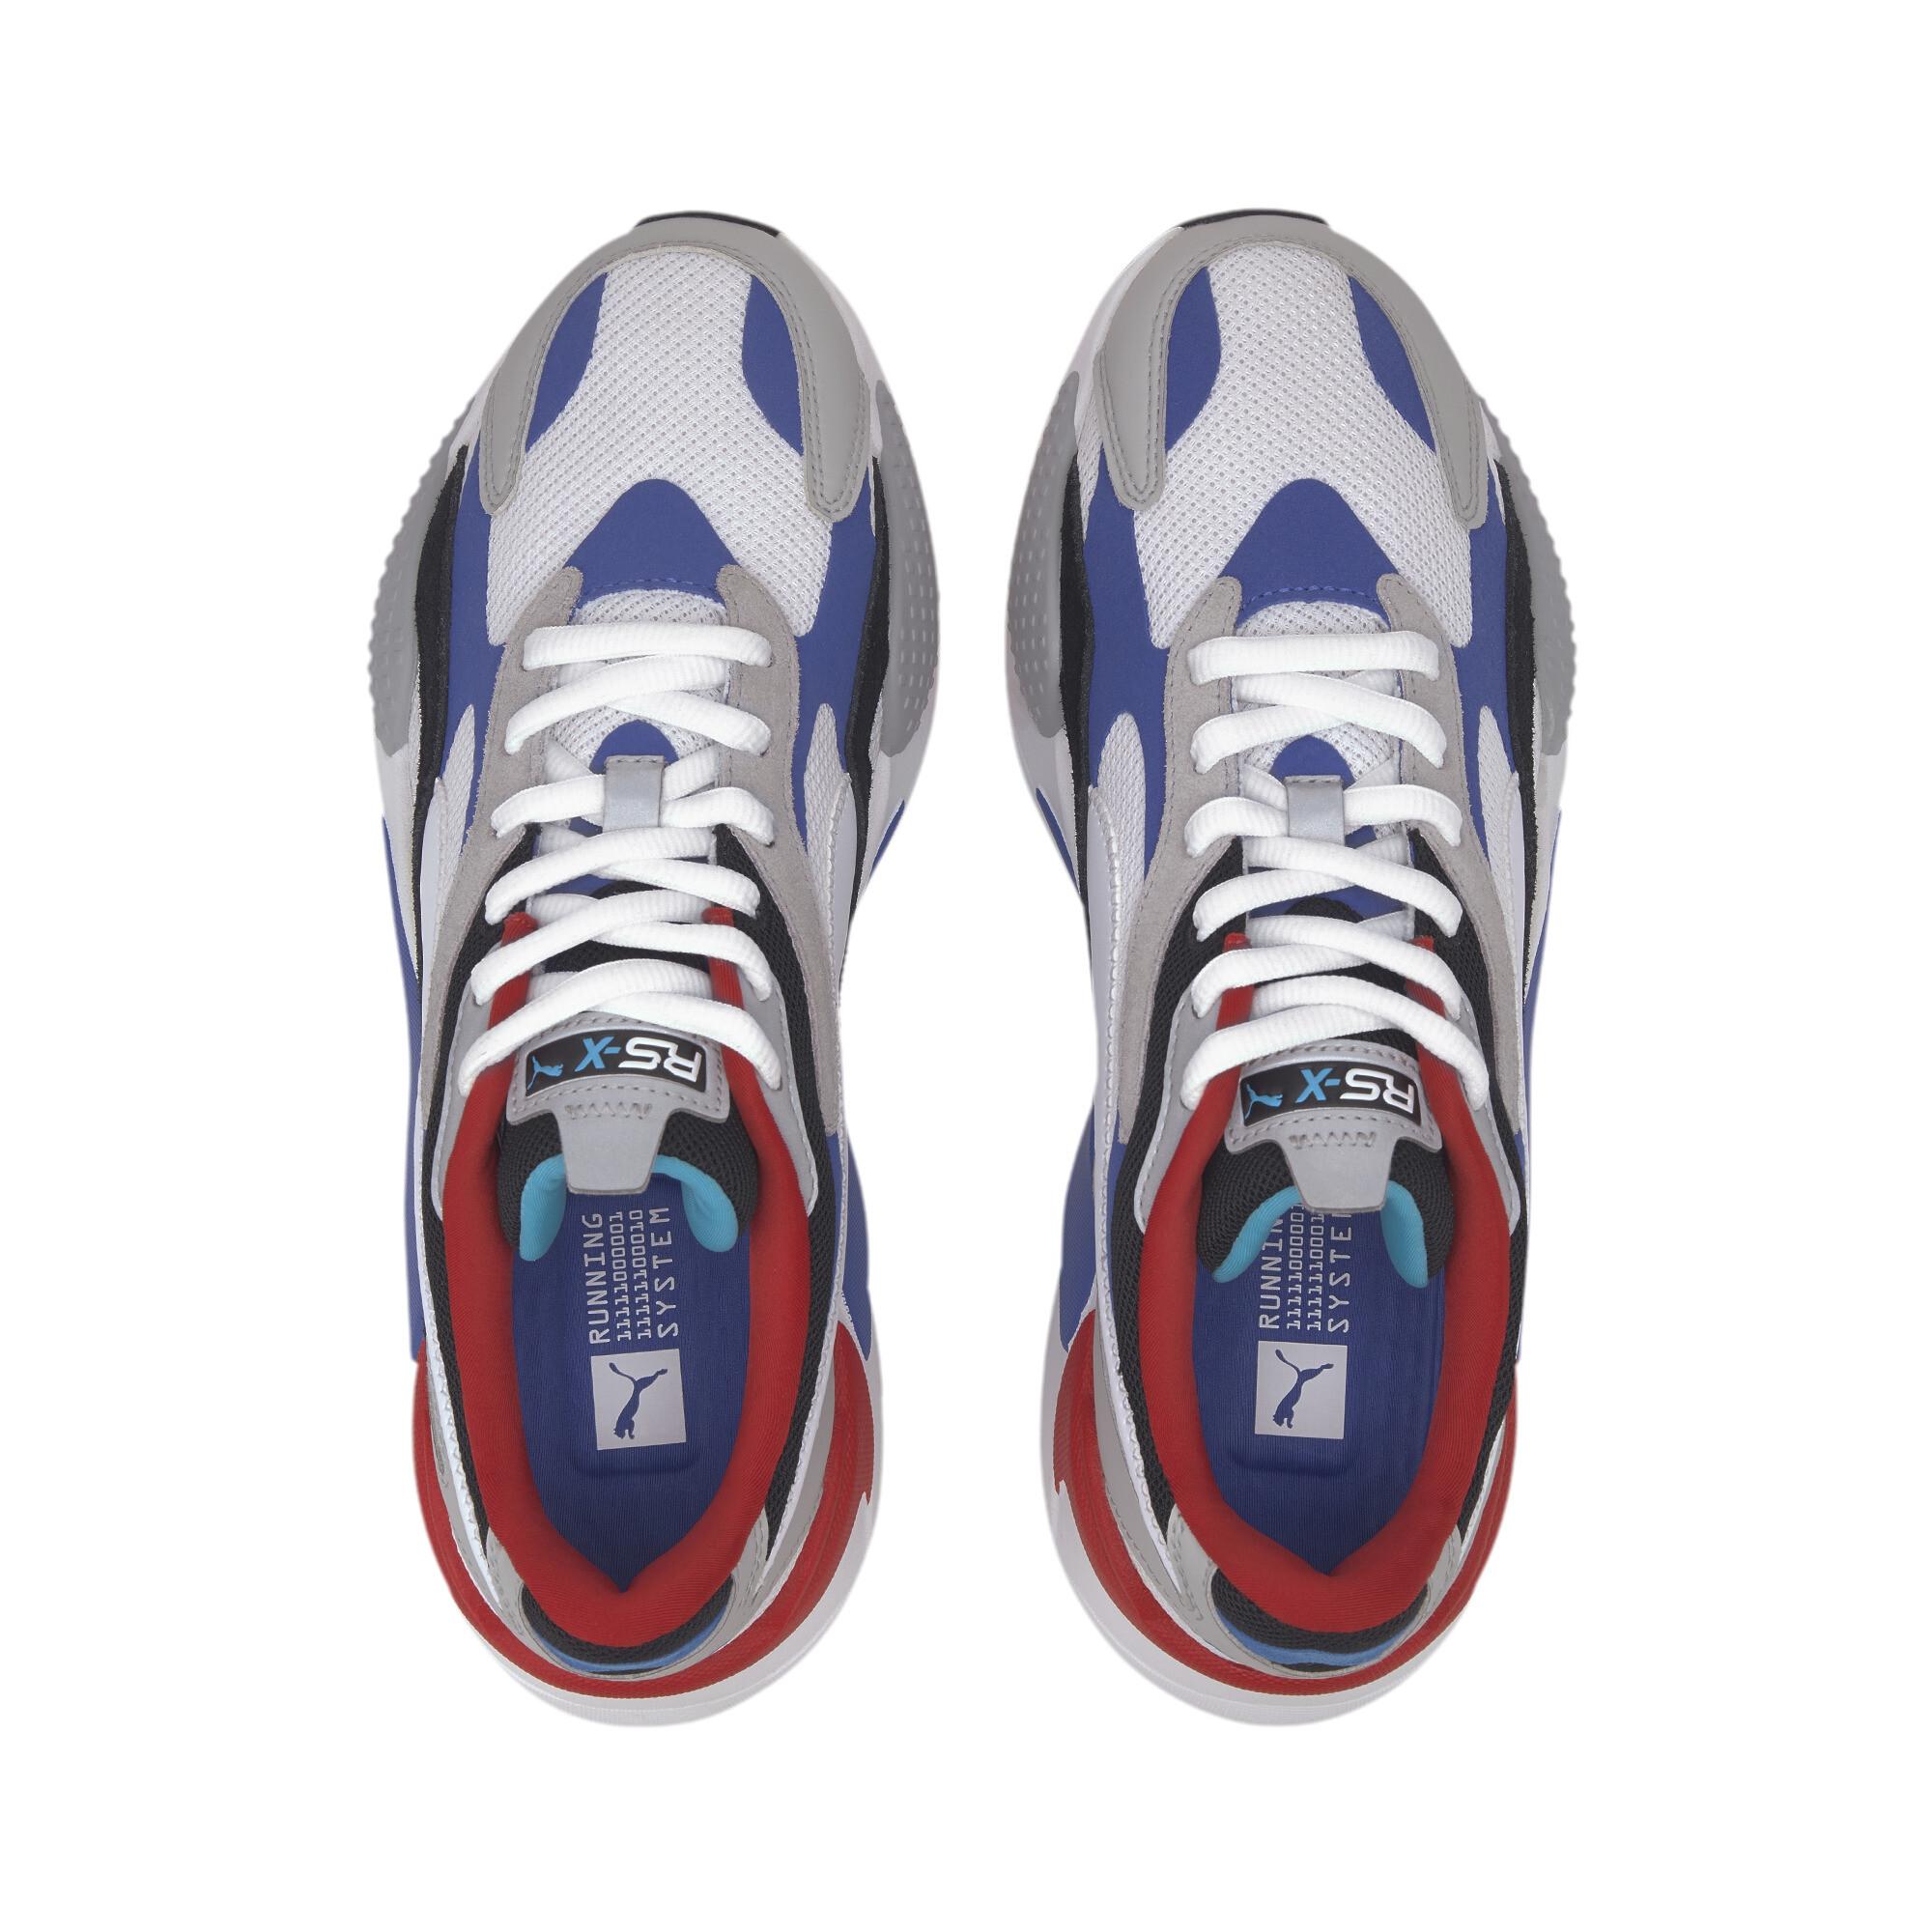 PUMA-Men-039-s-RS-X-Puzzle-Sneakers thumbnail 8